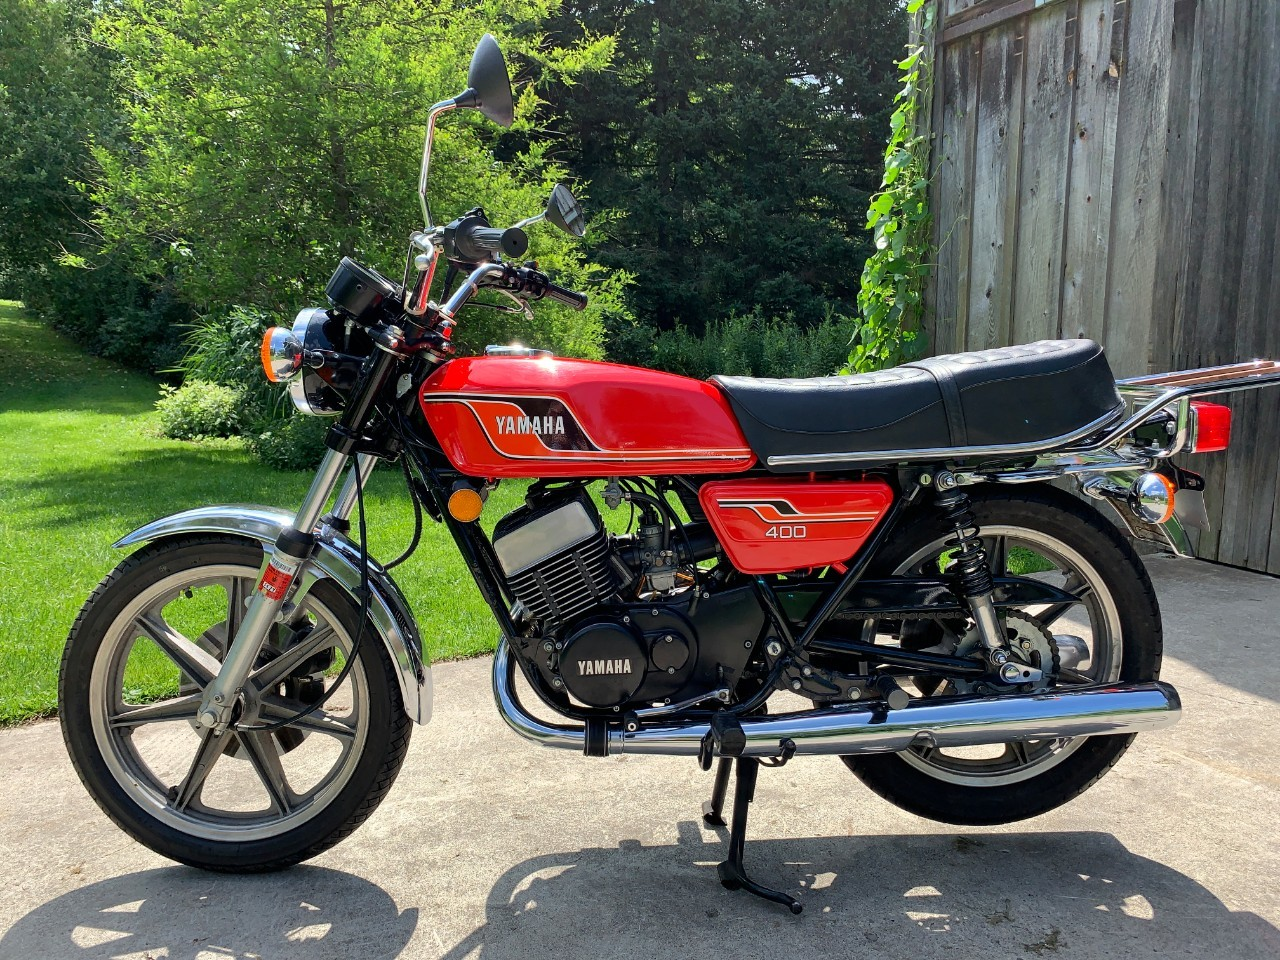 RD400 For Sale - Yamaha 356953,ATV Four Wheeler,Side by Side